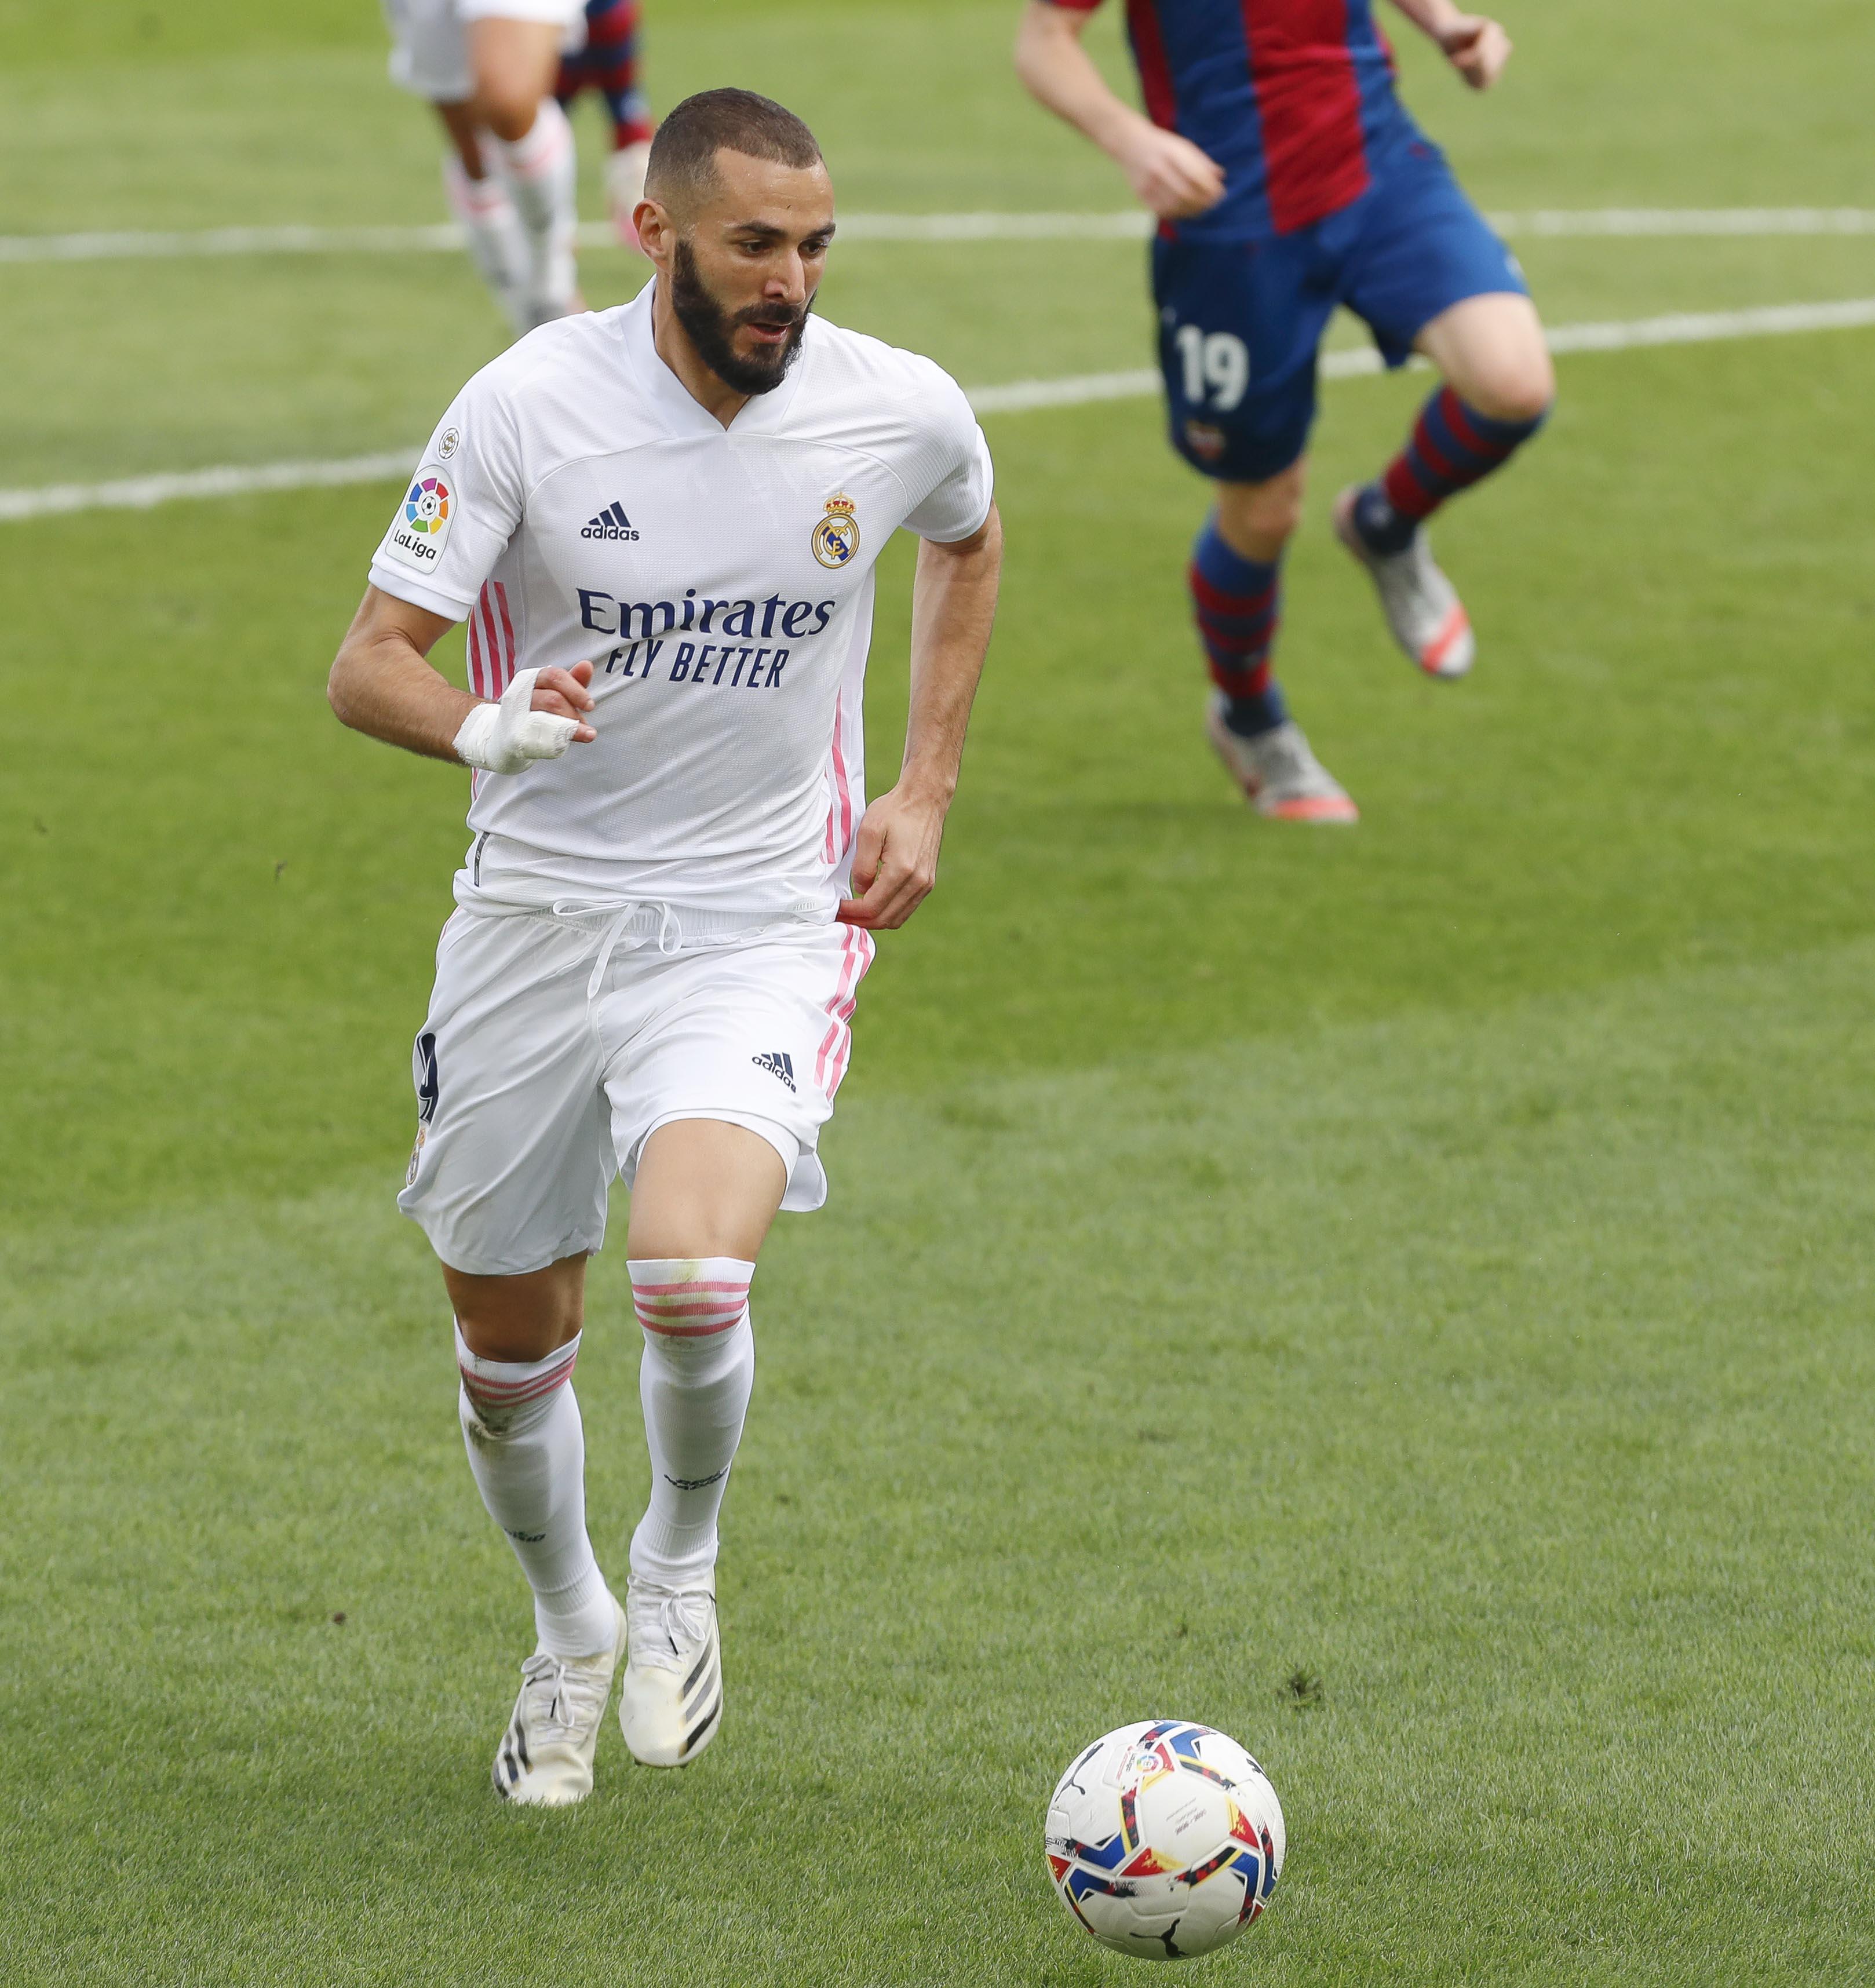 <a href='/players/karim-benzema'>Karim Benzema</a> (<a href='/clubs/real-madrid'>Real Madrid</a>).jpeg